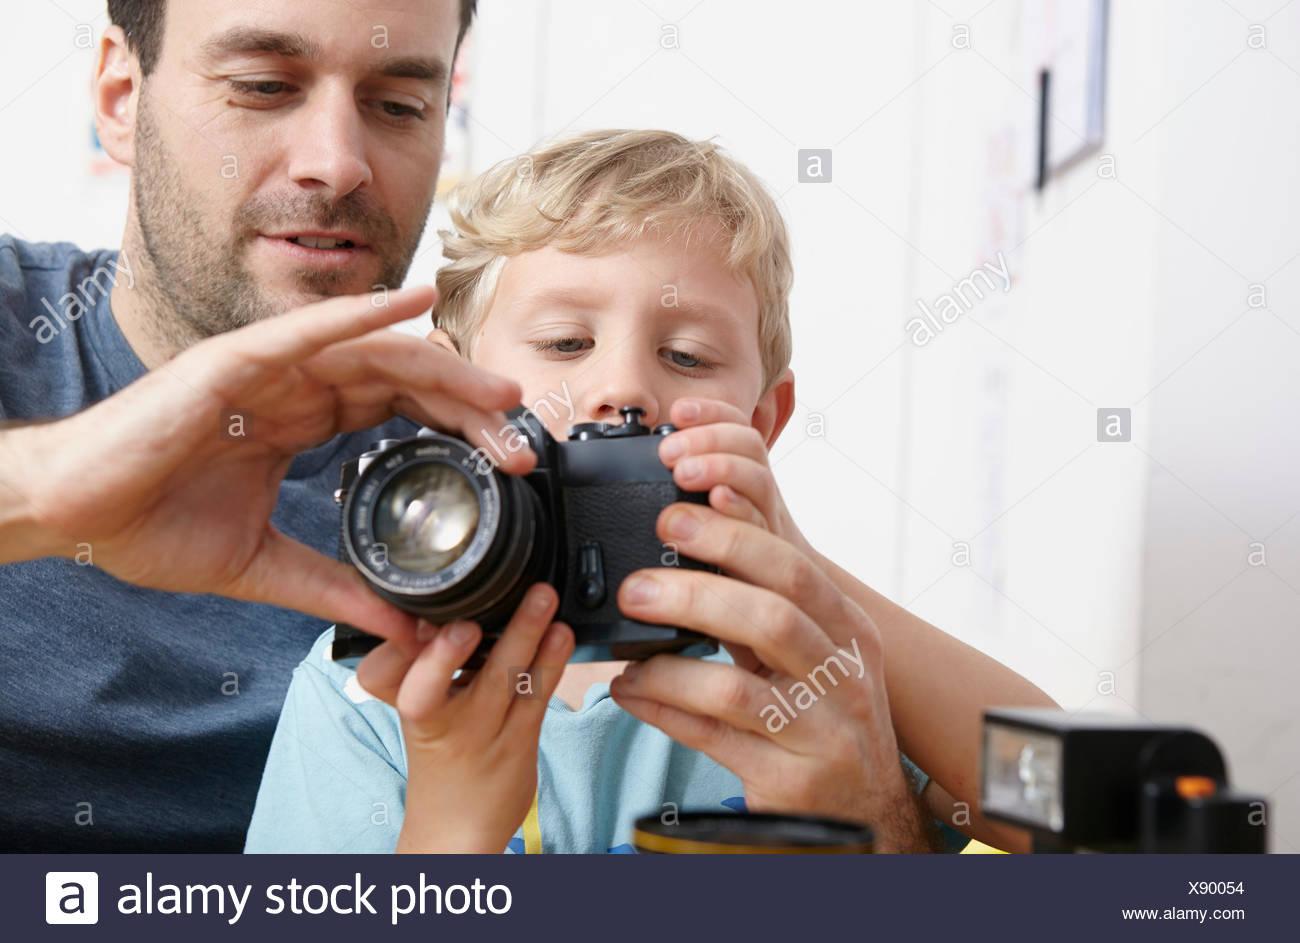 Father explaining analogue camera to son - Stock Image